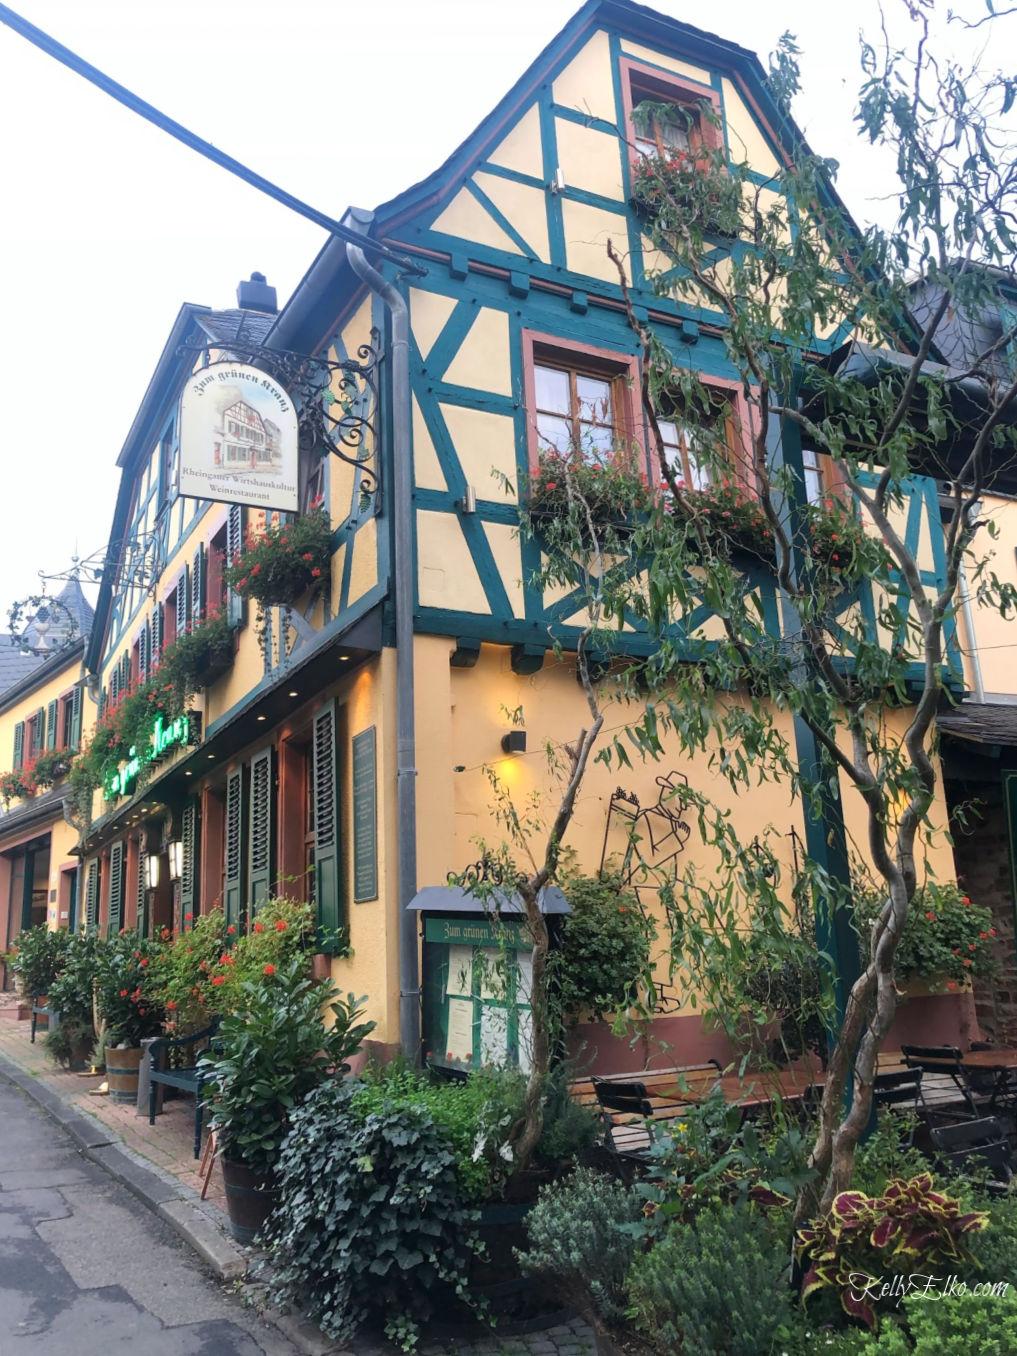 Rudesheim Germany is a charming little town with beautiful architecture kellyelko.com #Rudesheim #germany #rhine #rivercruise #myvikingstory #travel #travelblog #travelblogger #kellyelko